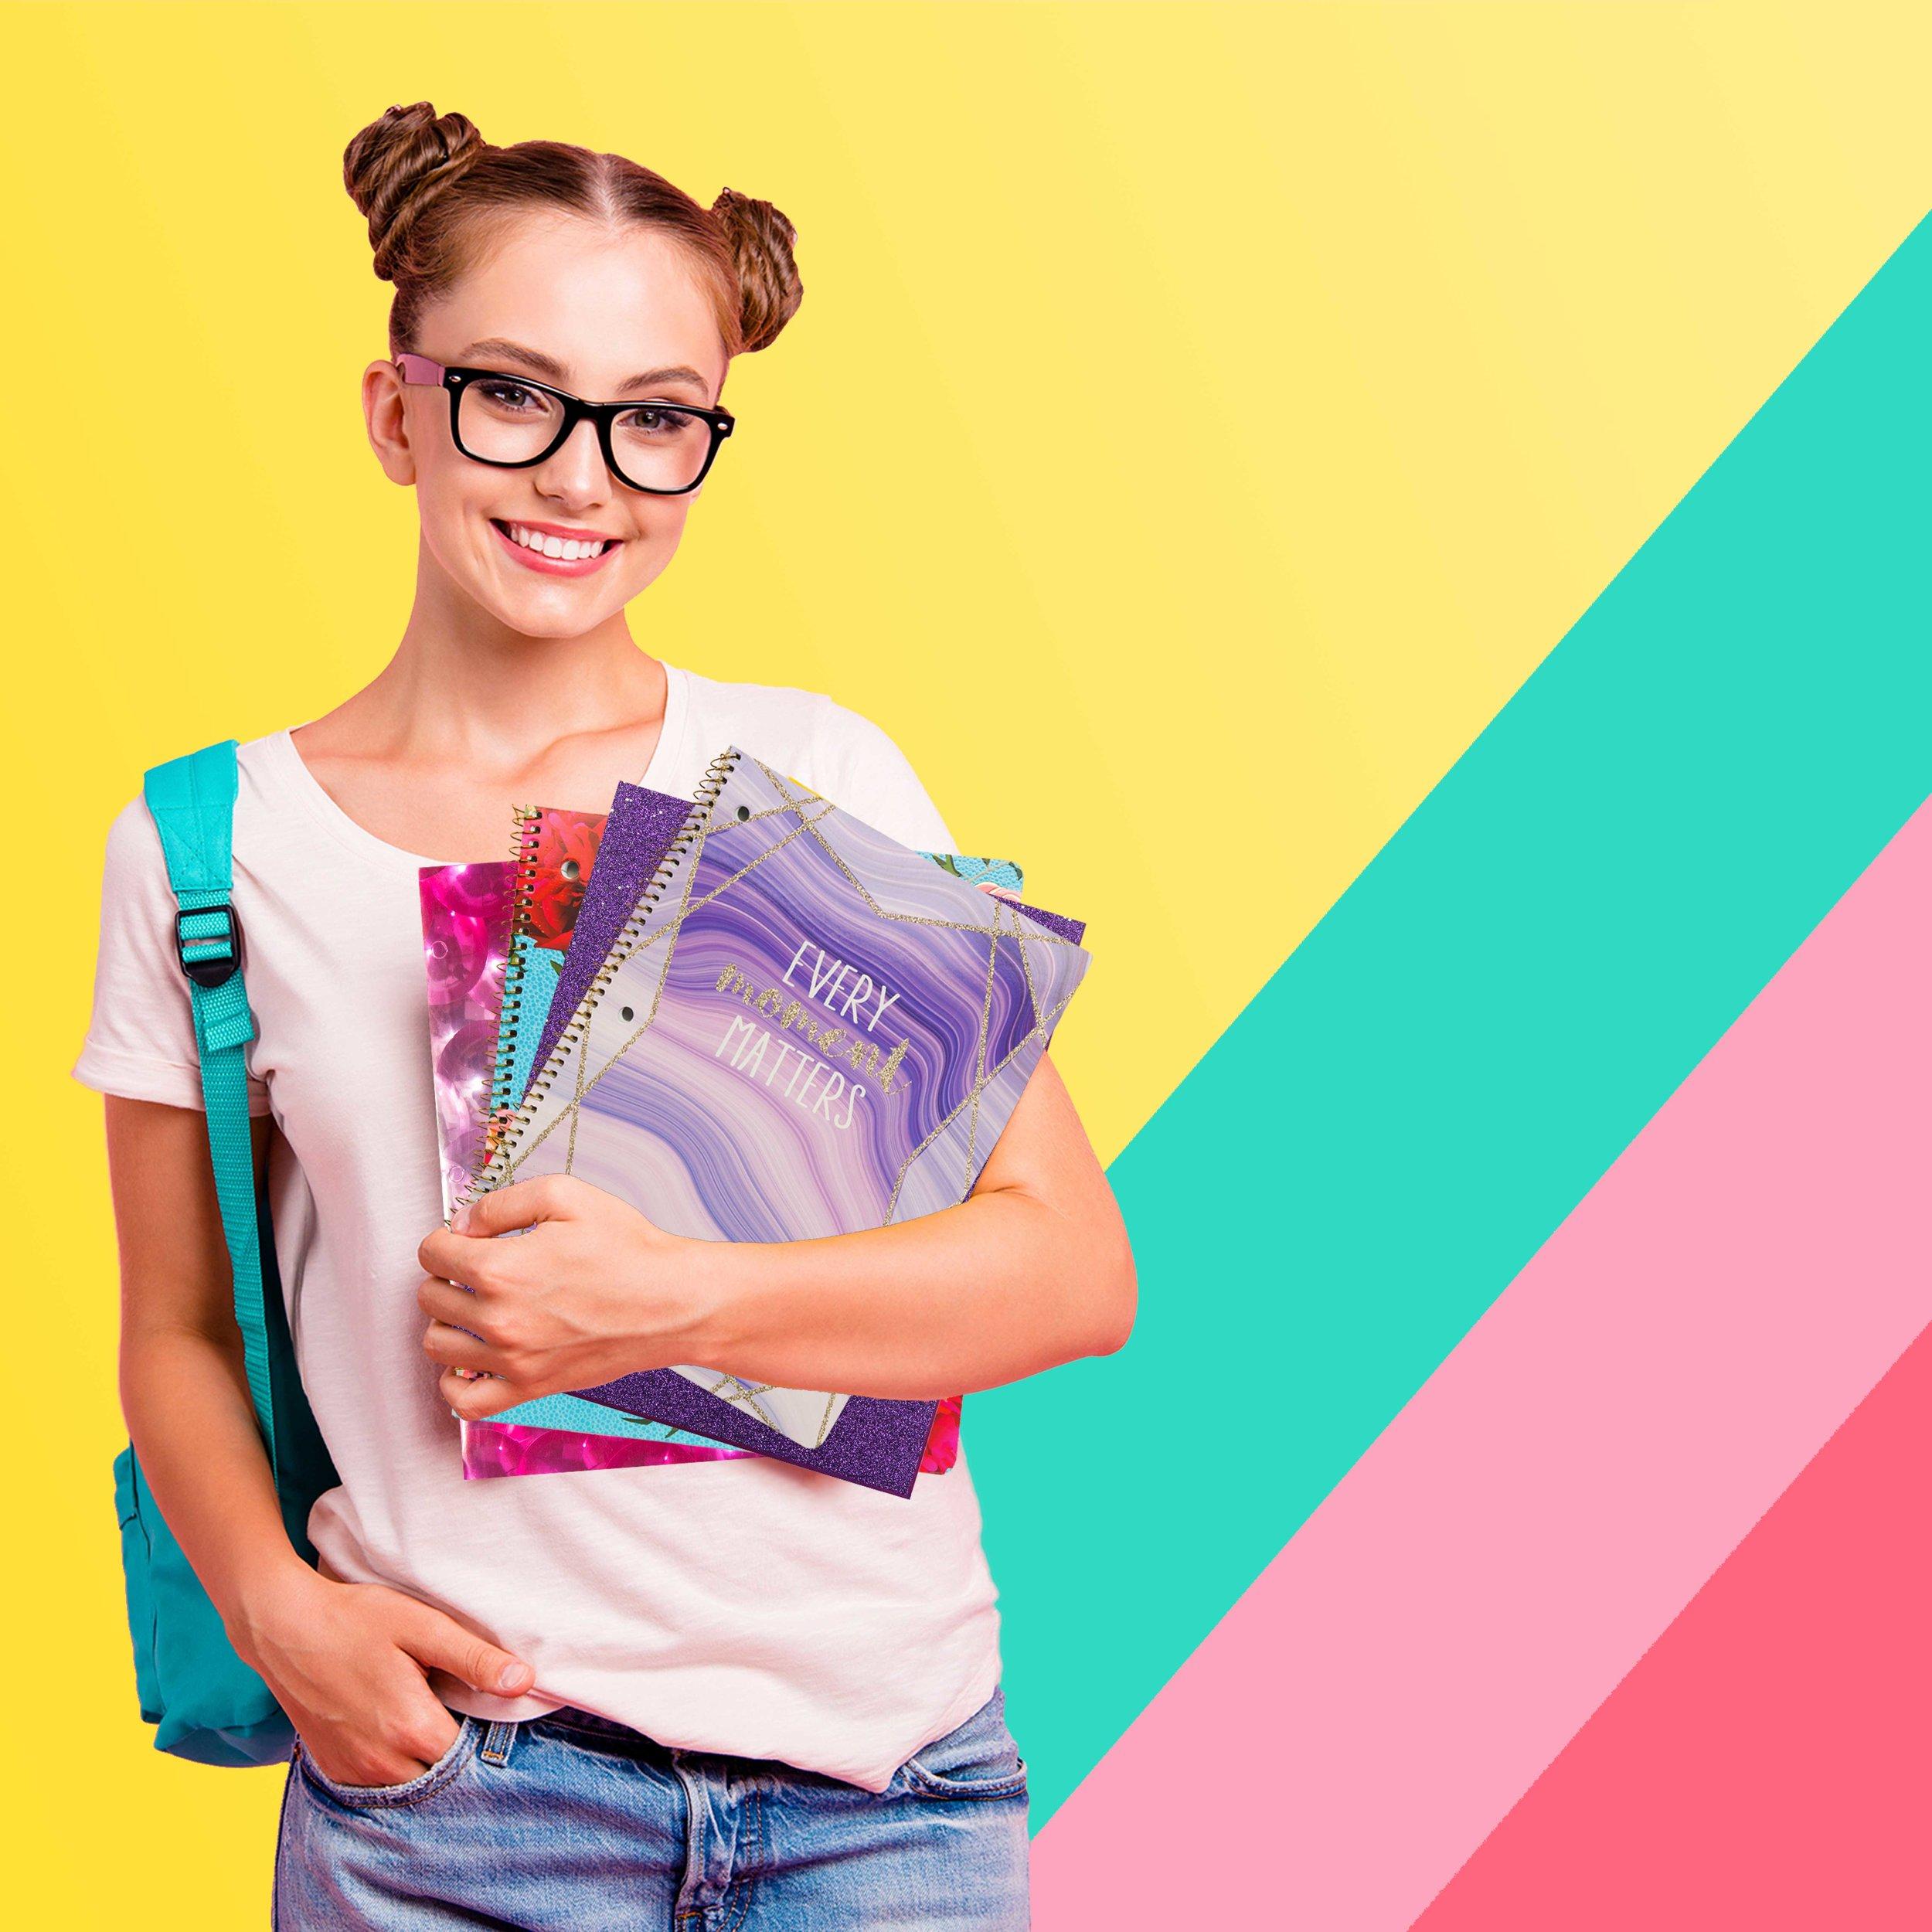 Girl-With-Books.jpg